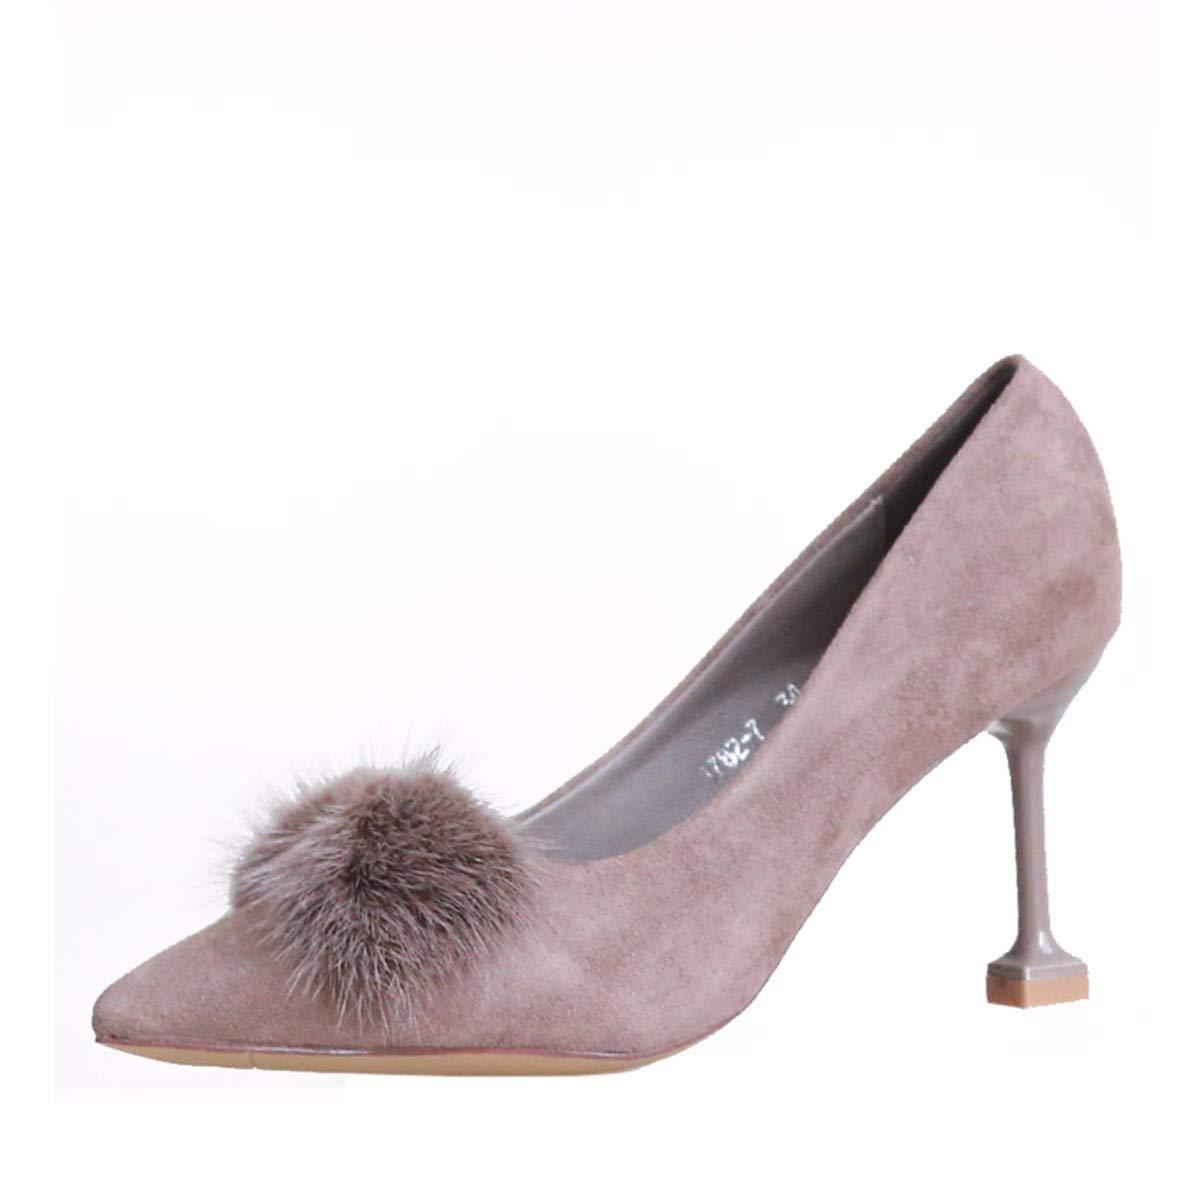 KPHY Damenschuhe/8-Cm-Schuhe Mit Hohen Absätzen Herbst Dünne Frauen Schuhe Mode Sharp Hat Schuhe Dünn und Einzelne Schuhe.36 Schwarz